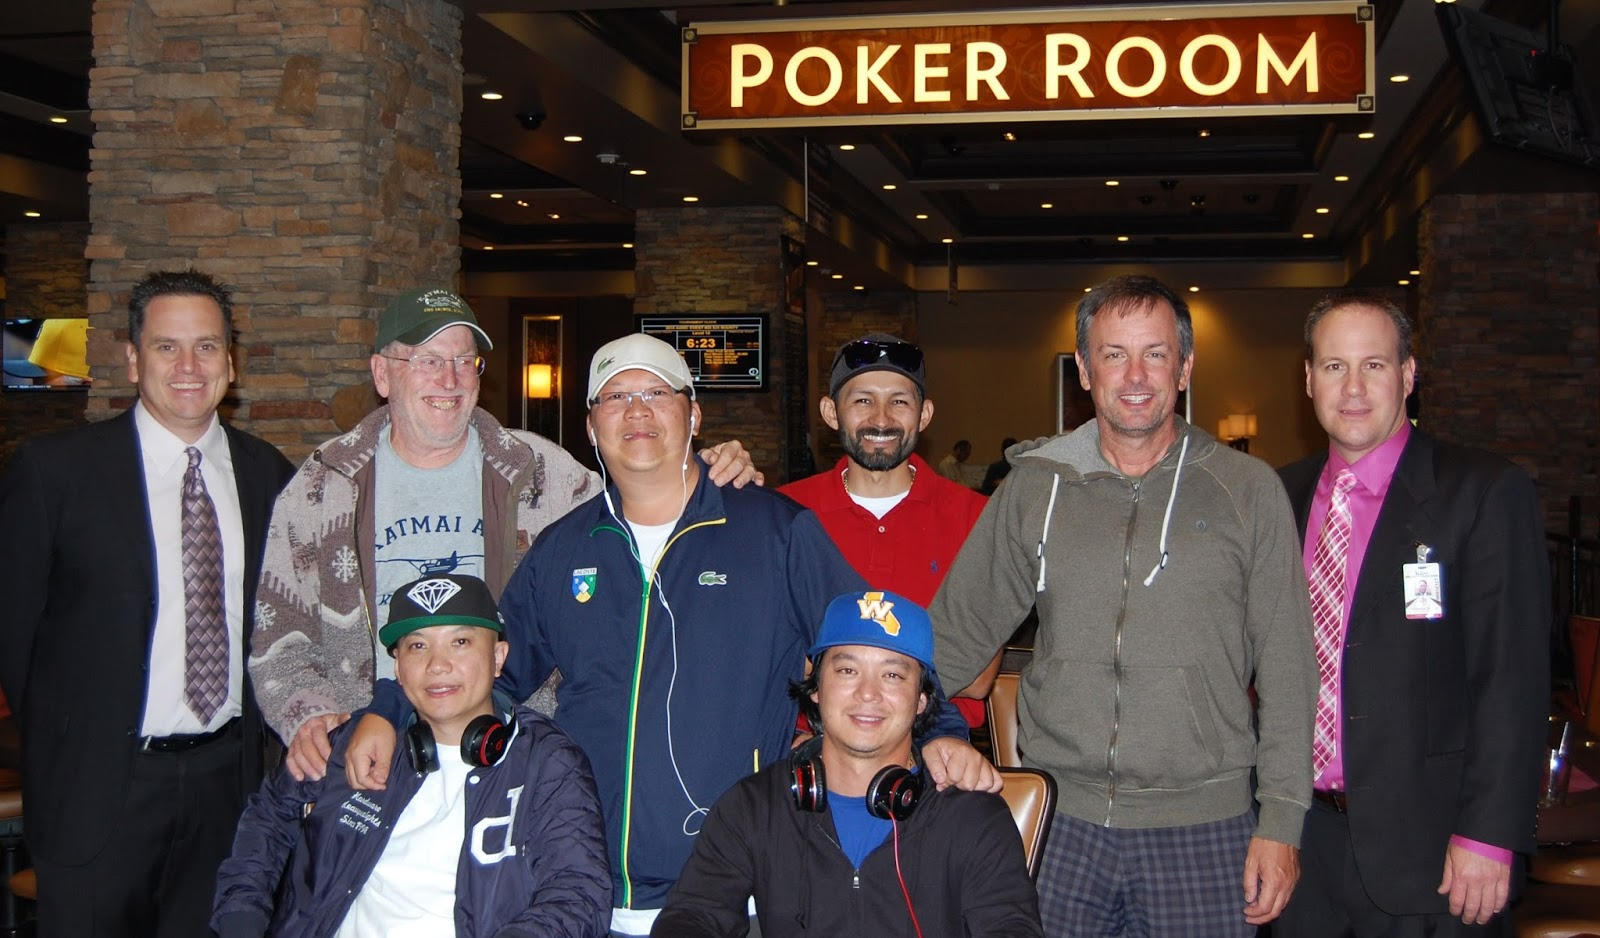 Lincoln poker league